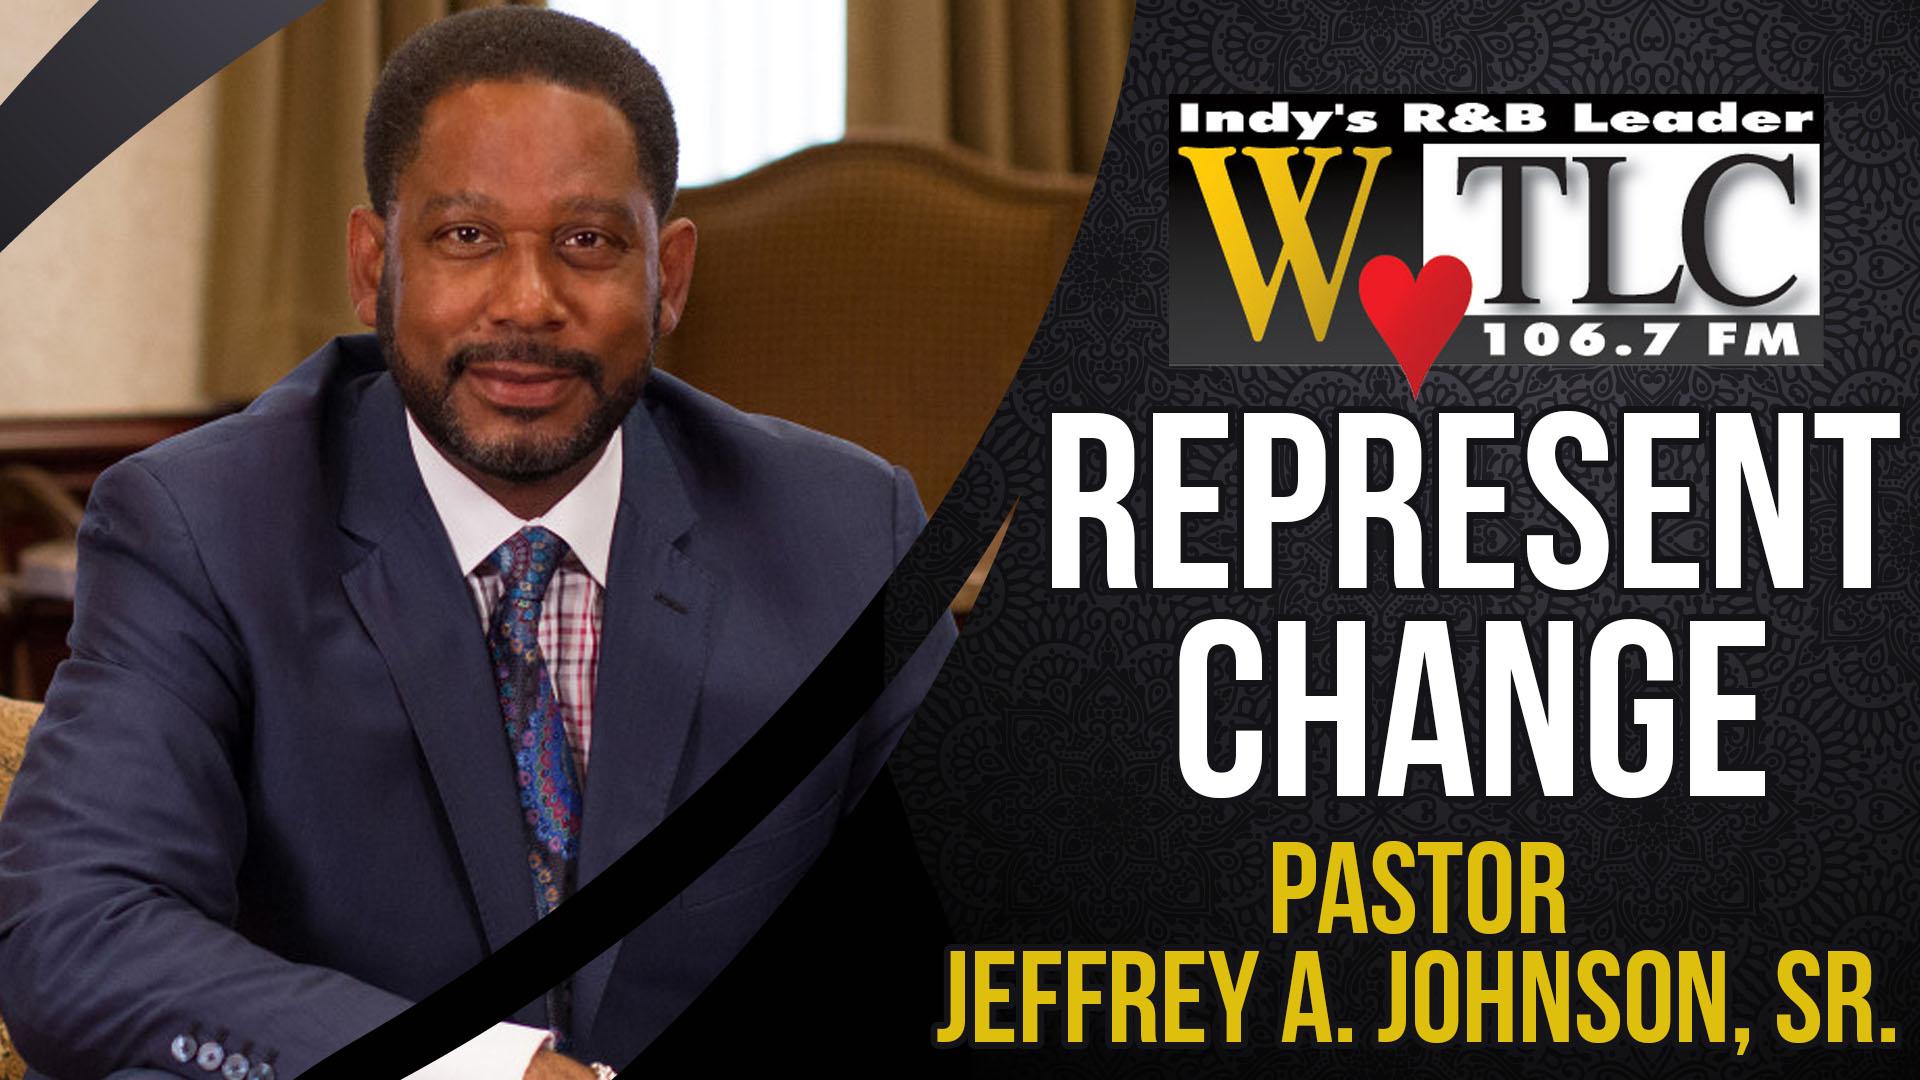 Represent Change: Pastor Jeffrey A. Johnson, Sr.